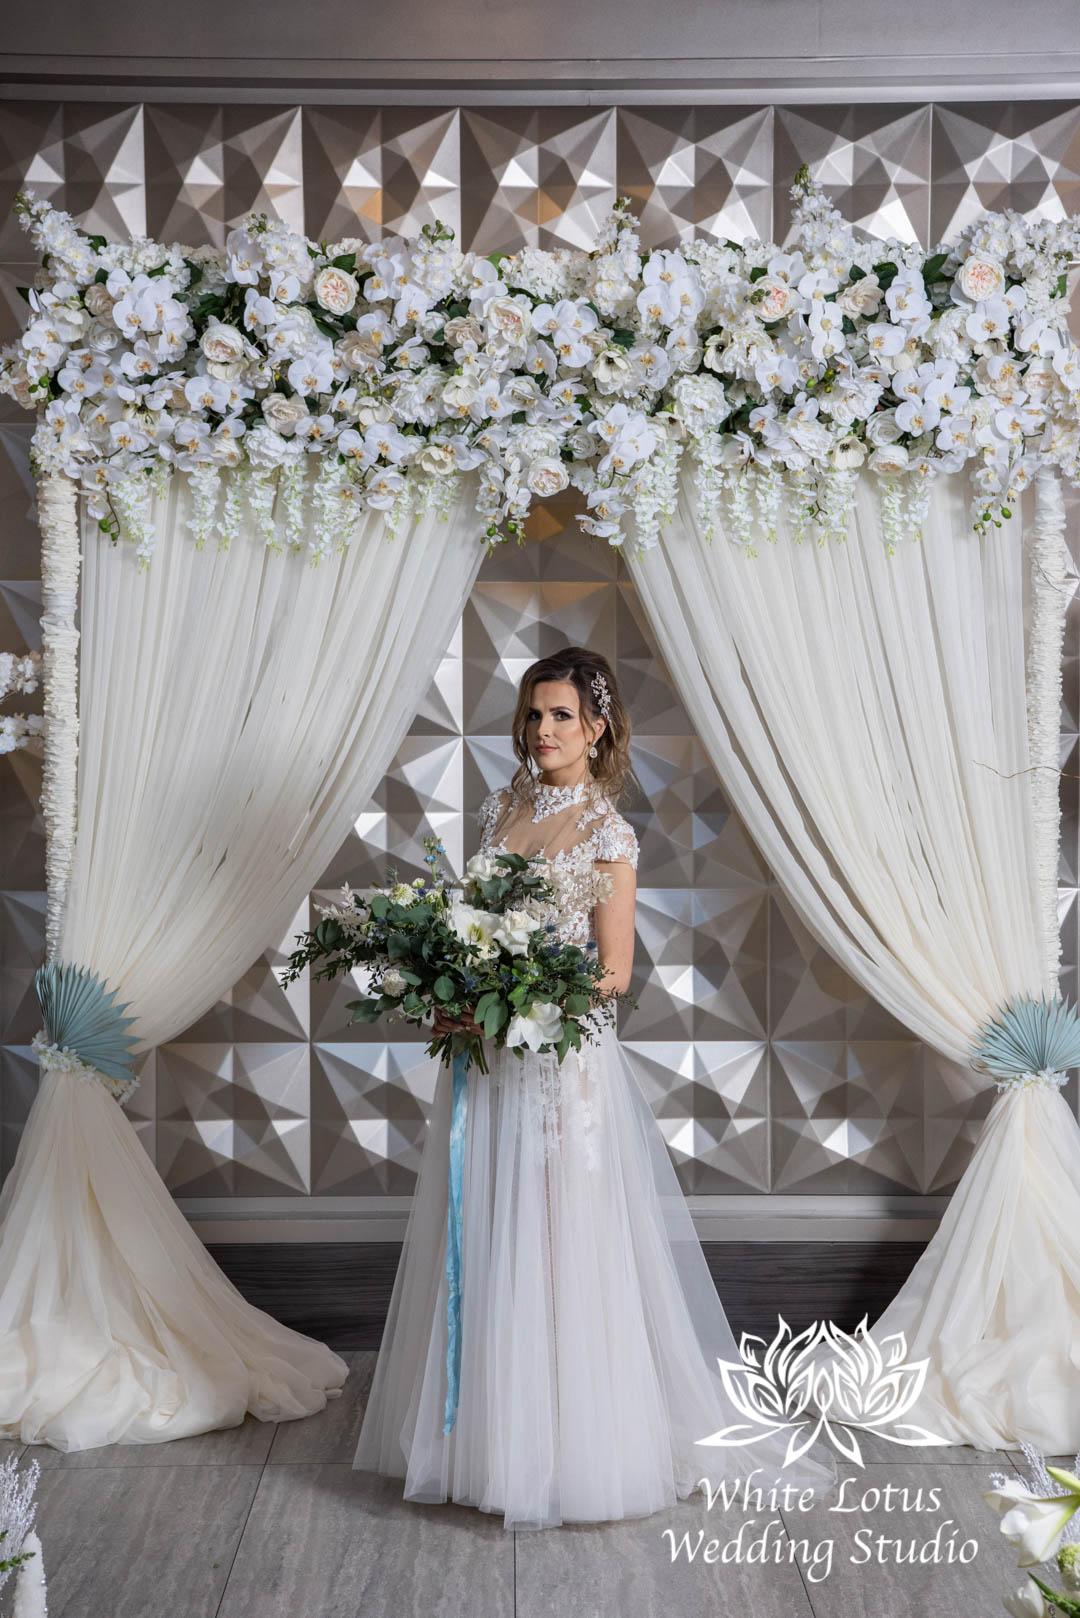 050- GLAM WINTERLUXE WEDDING INSPIRATION